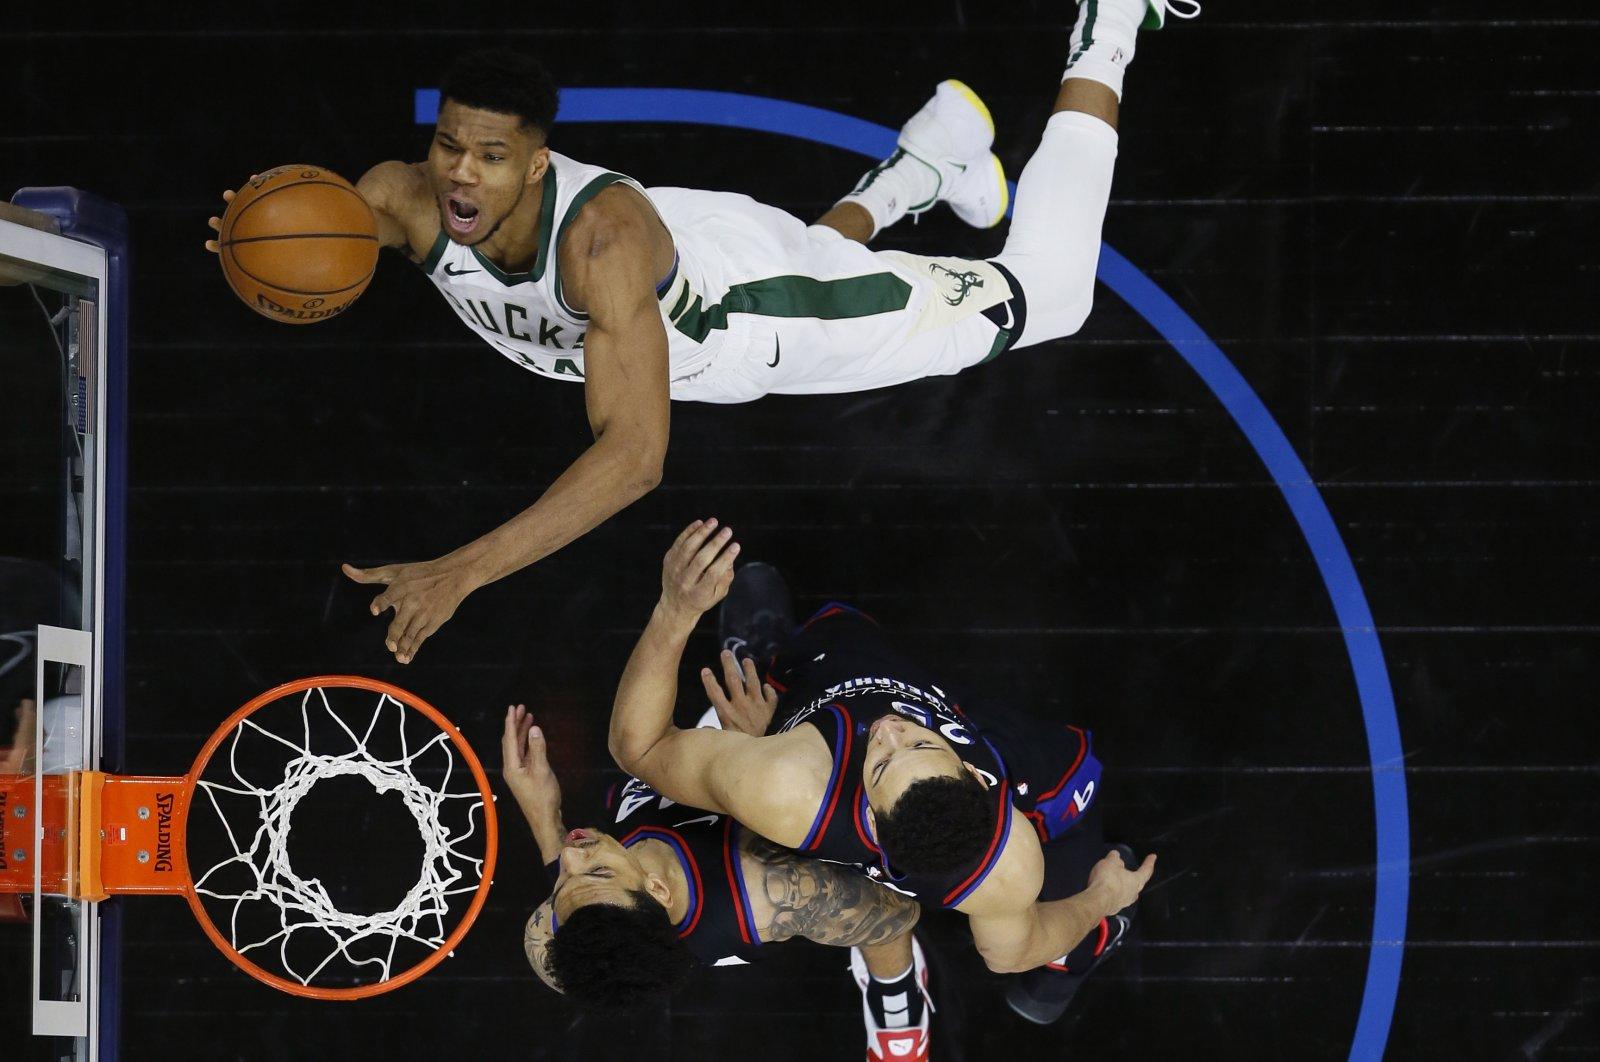 Milwaukee Bucks' Giannis Antetokounmpo, top, goes up for a shot against Philadelphia 76ers' Ben Simmons (C) and Danny Green during an NBA game, Philadelphia, Pennsylvania, March 17, 2021. (AP Photo)